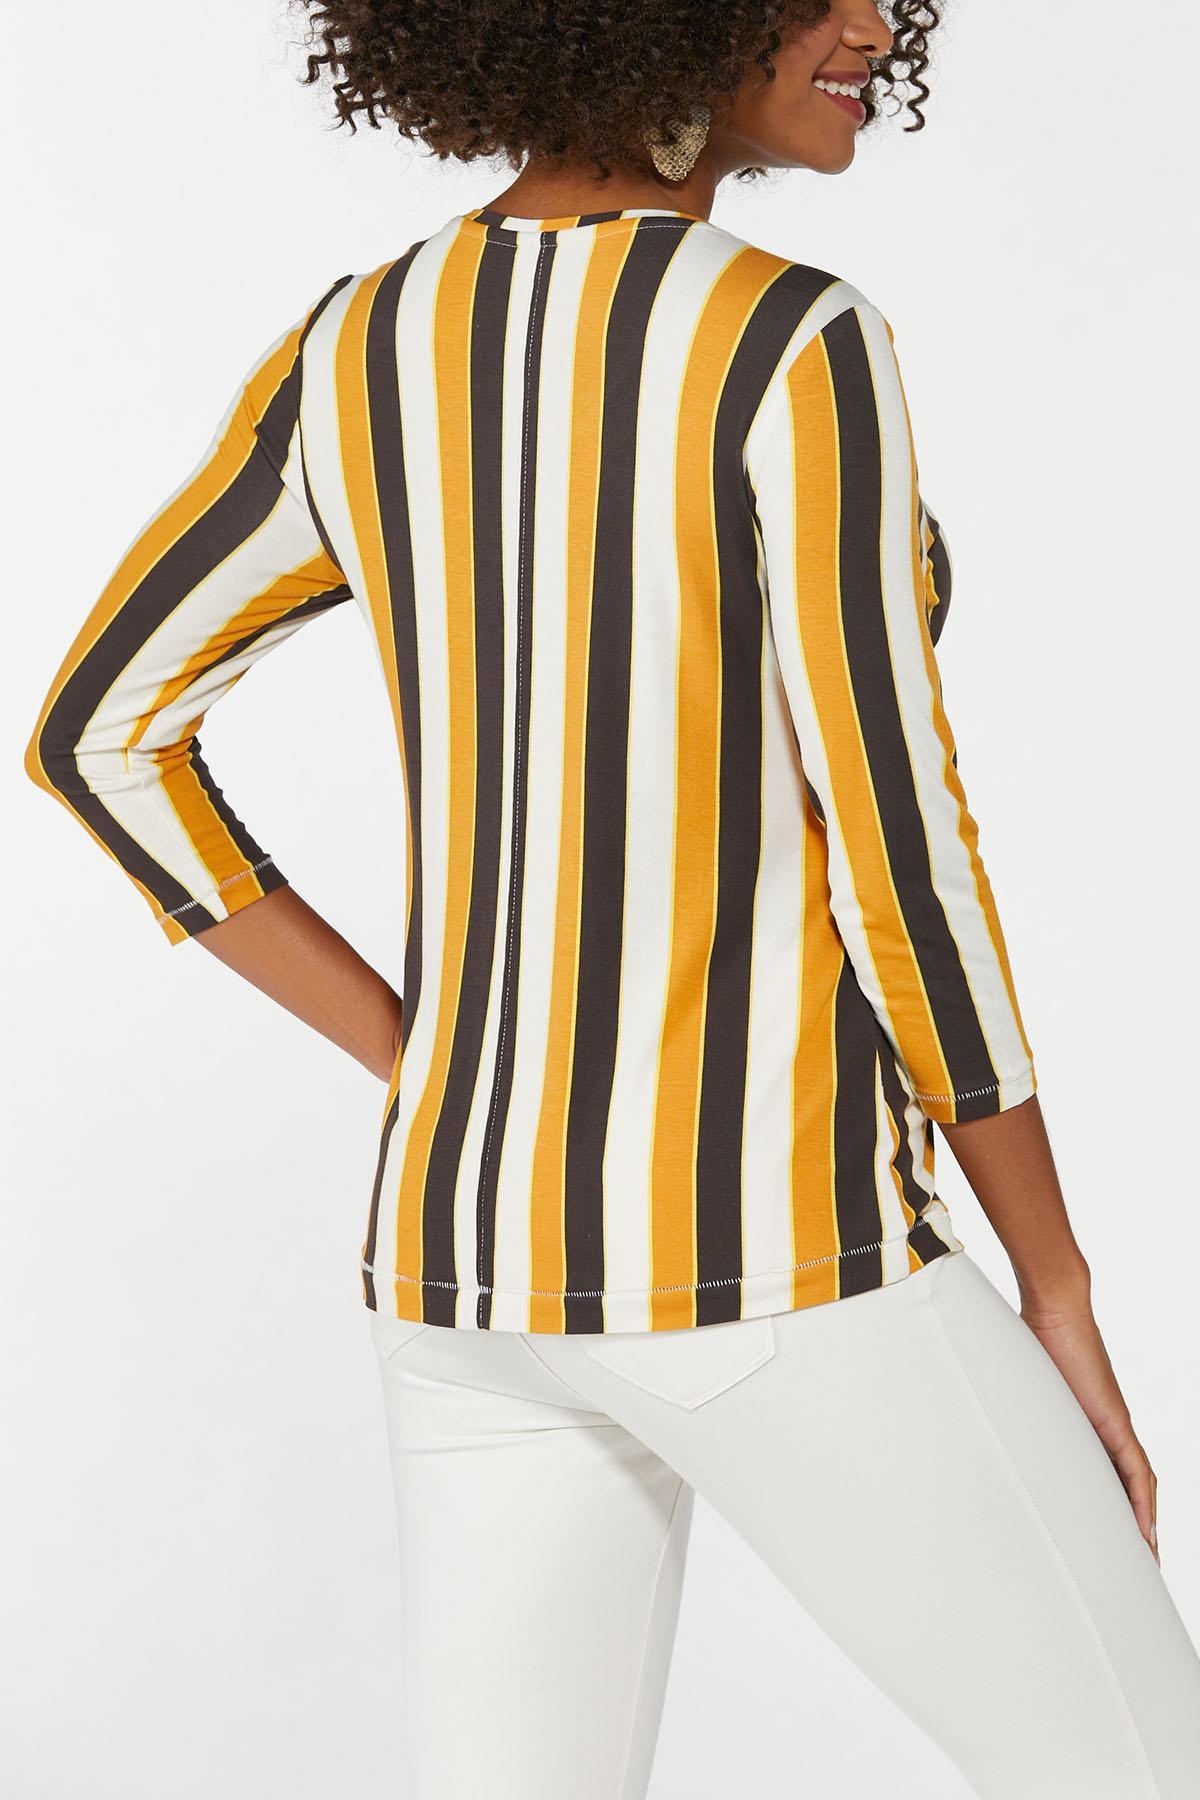 Gold Stripe Top (Item #44702981)